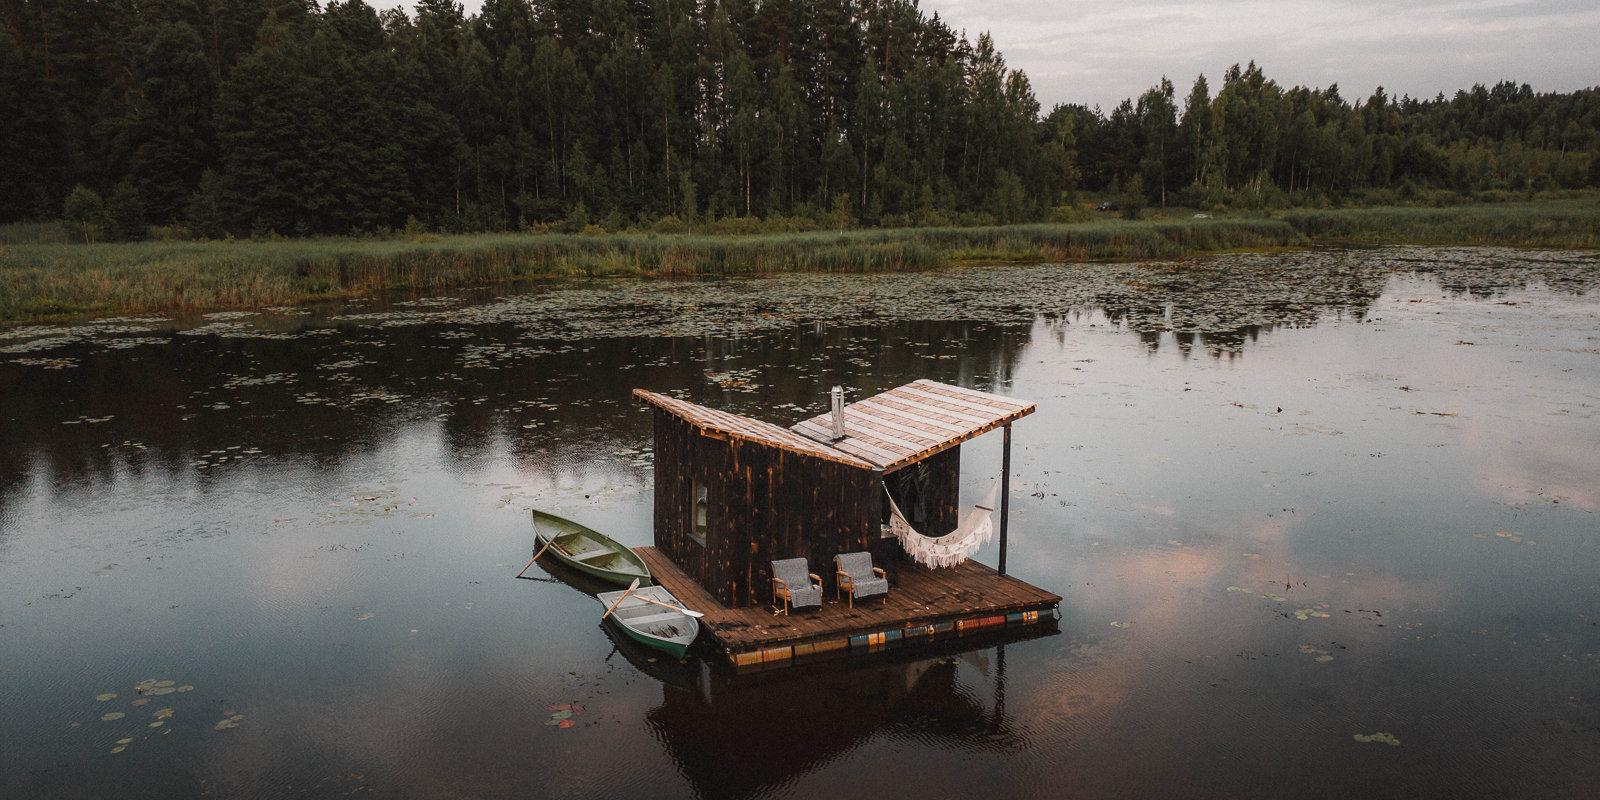 Своими руками: Как Калвис и Яна построили на озере под Талси плавучую баню